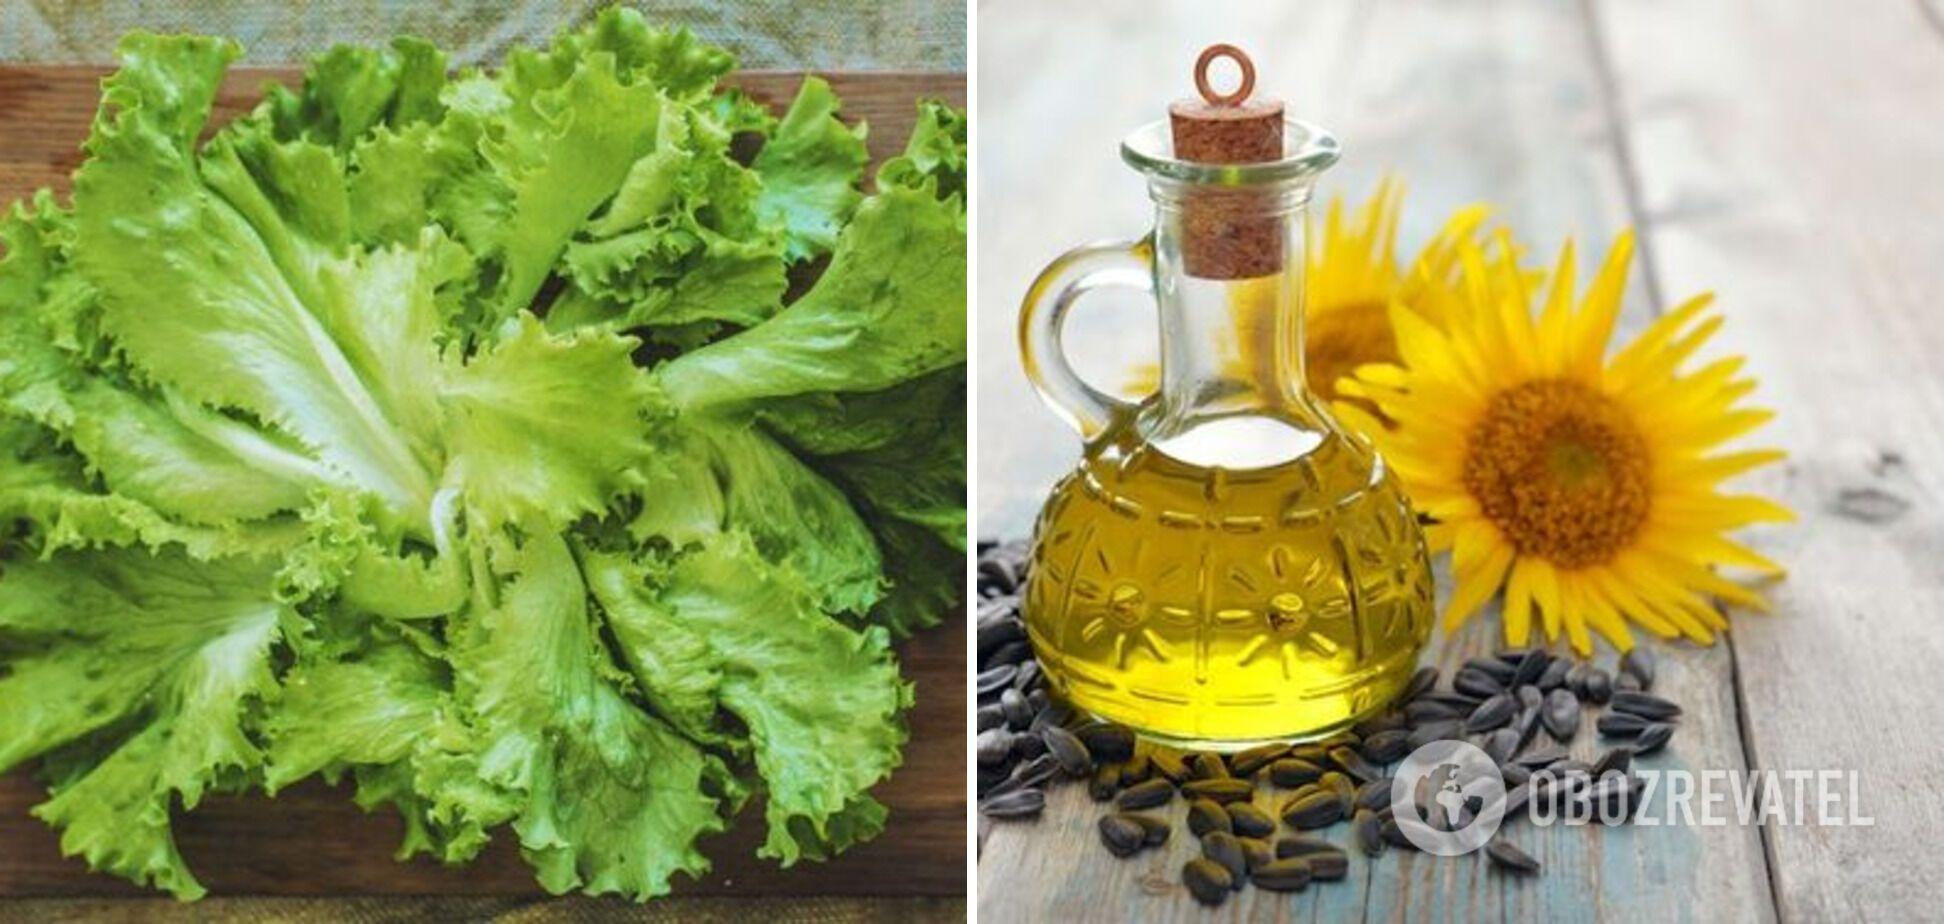 Сочетание Листьев салата и подсолнечного масла